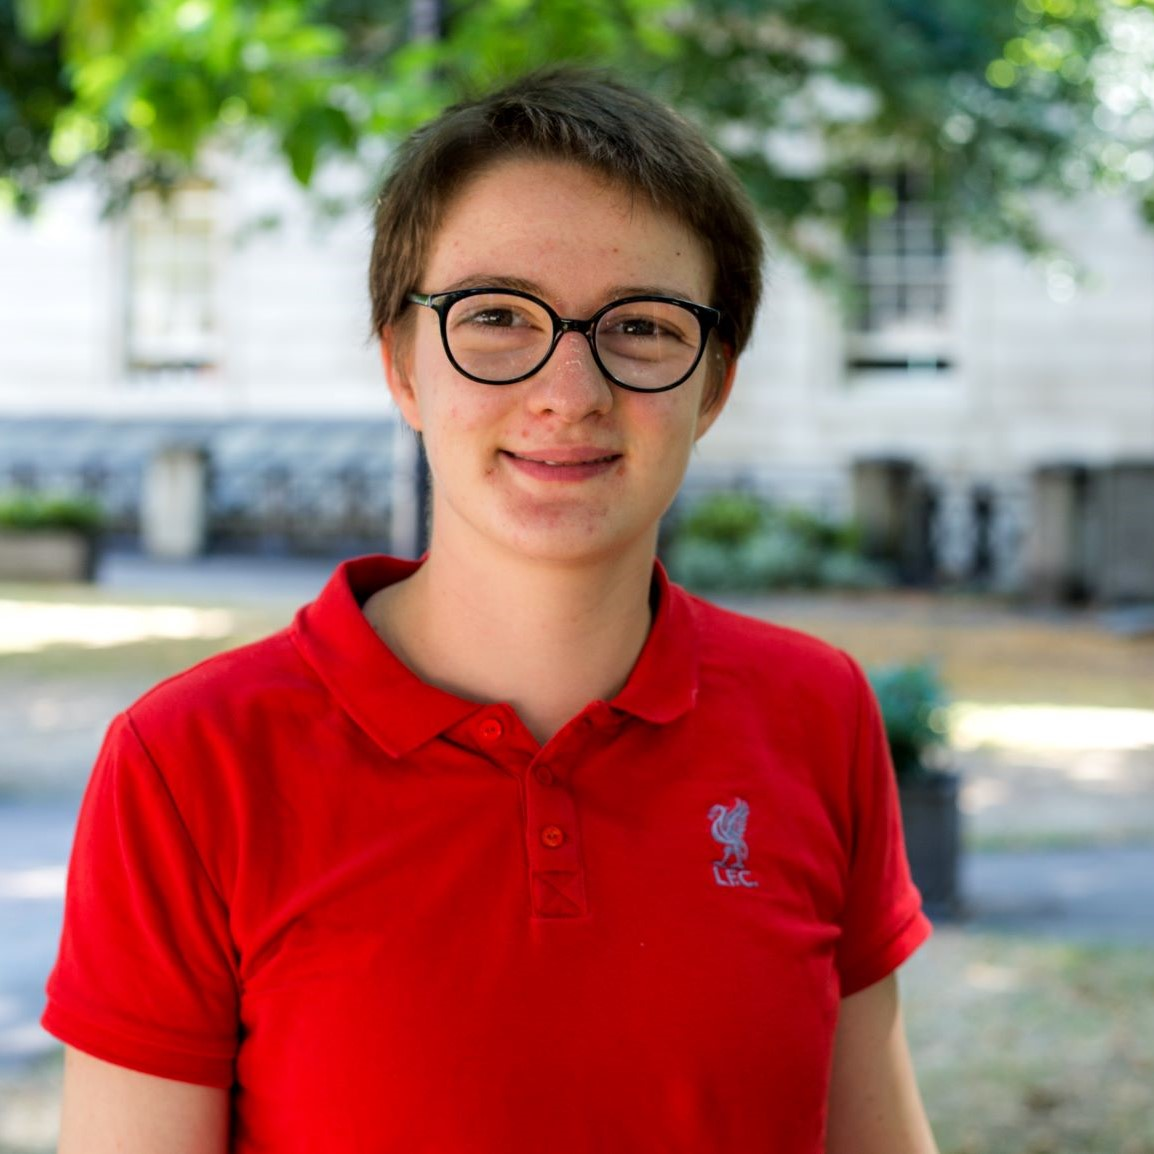 Juliette Helfi, former UCL Pre-University Summer School student